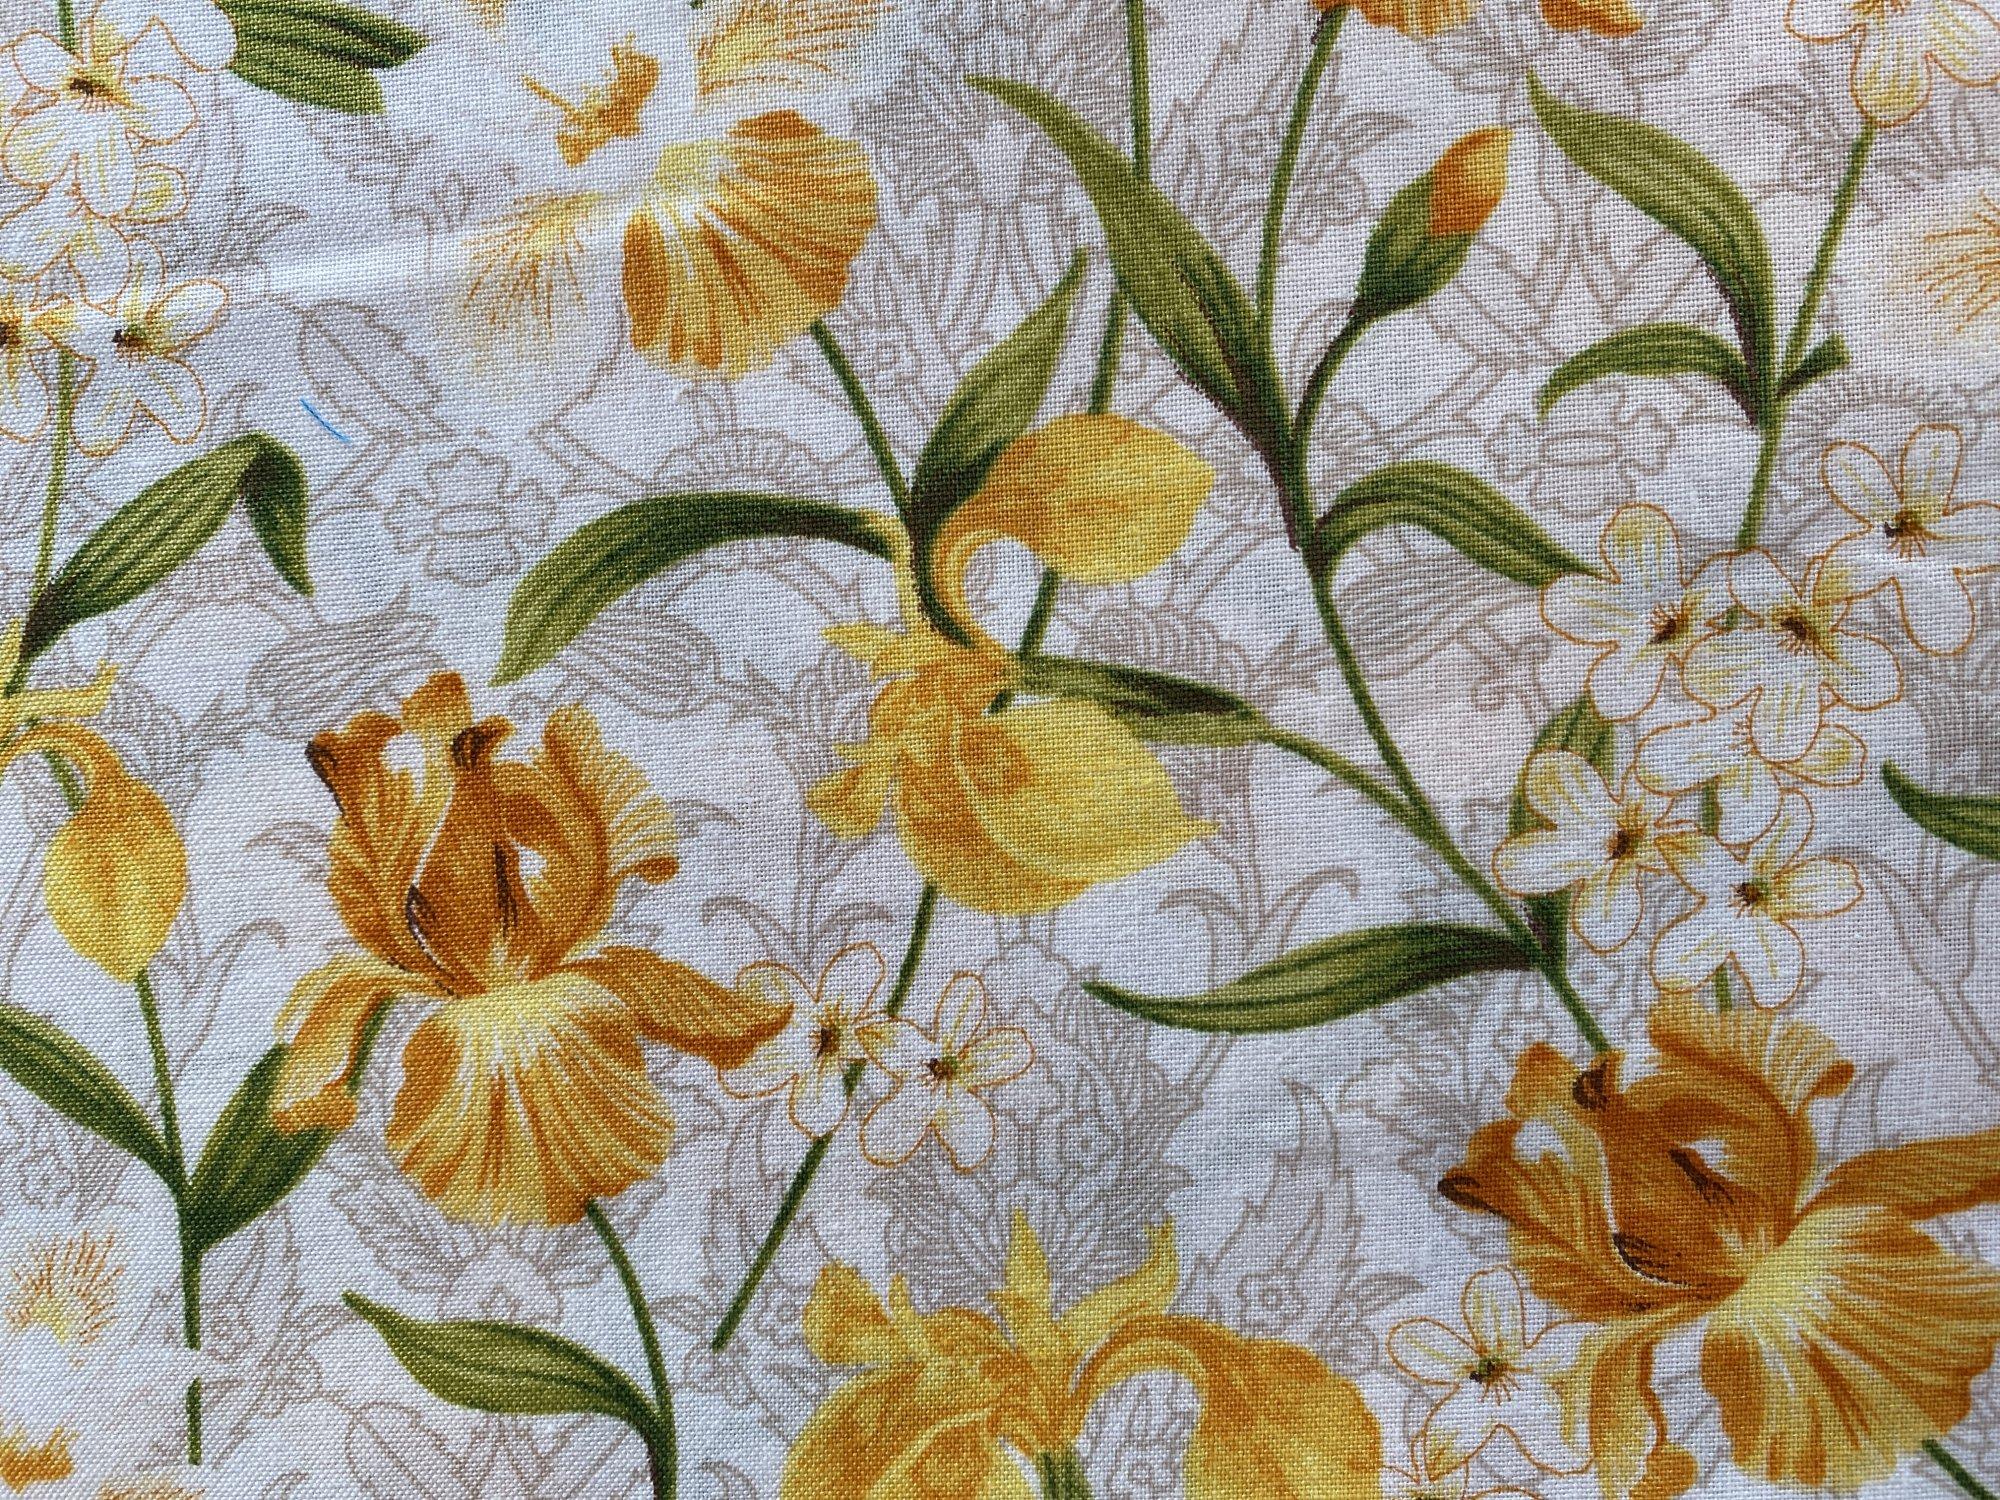 Serenity Irises